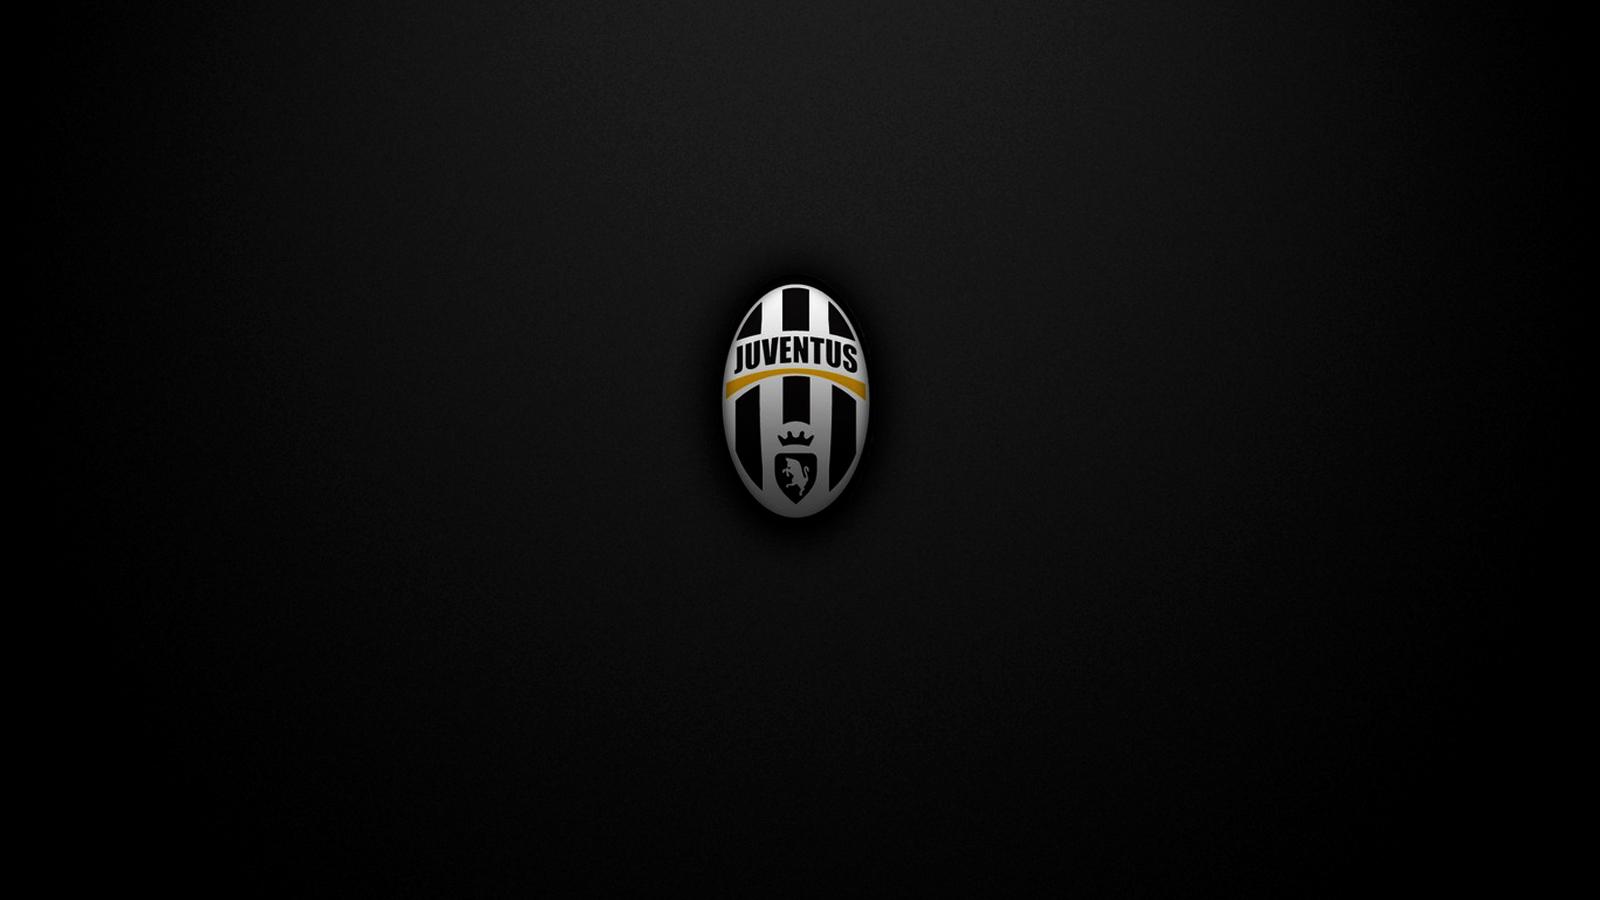 Juventus FC Logo HD Wallpapers HD Wallpapers Backgrounds Photos 1600x900